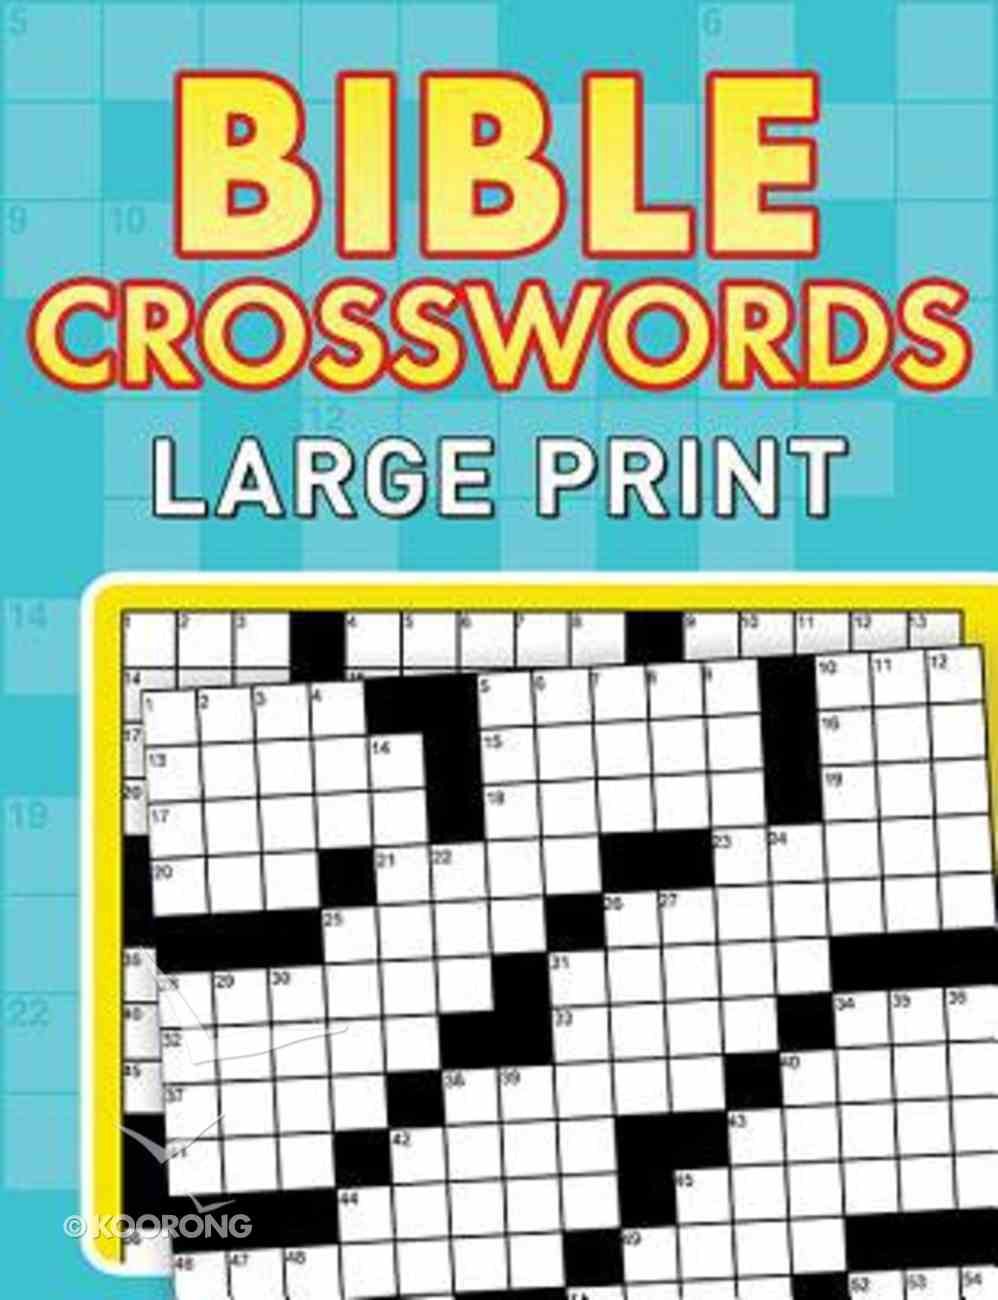 Bible Crosswords (Large Print) Paperback